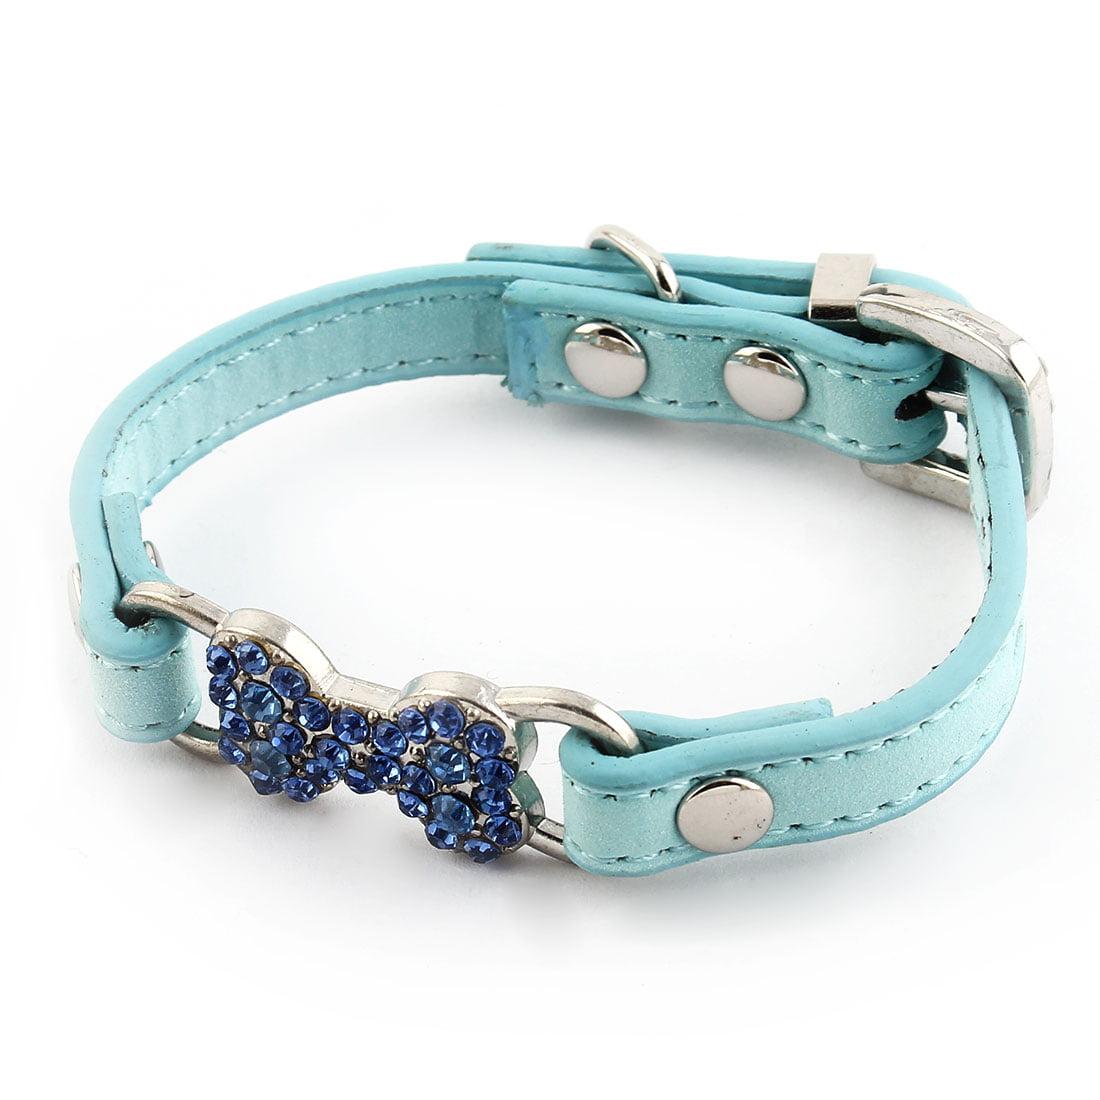 Bone Shape Decor Faux Rhinestones Inlaid Adjustable Pet Dog Cat Collar Blue XXS - image 5 of 5